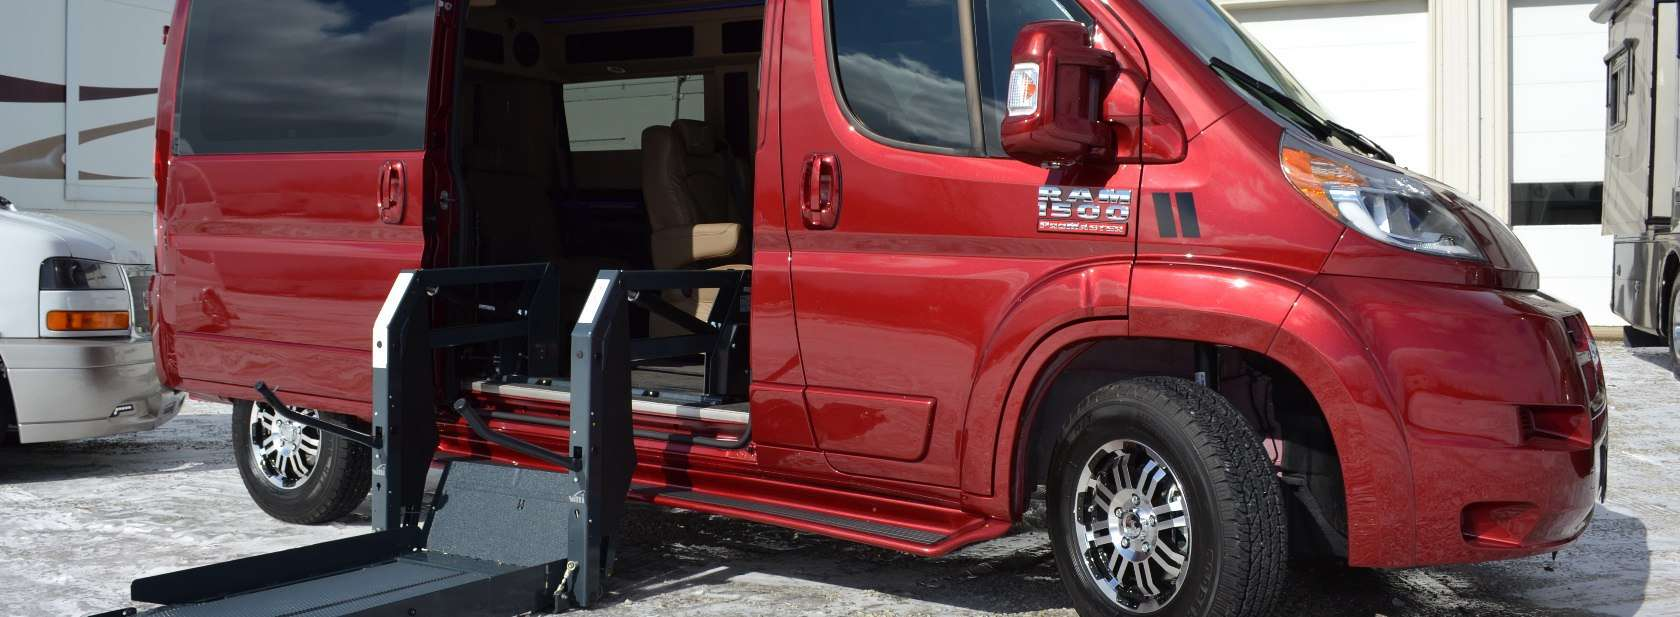 mobility-van